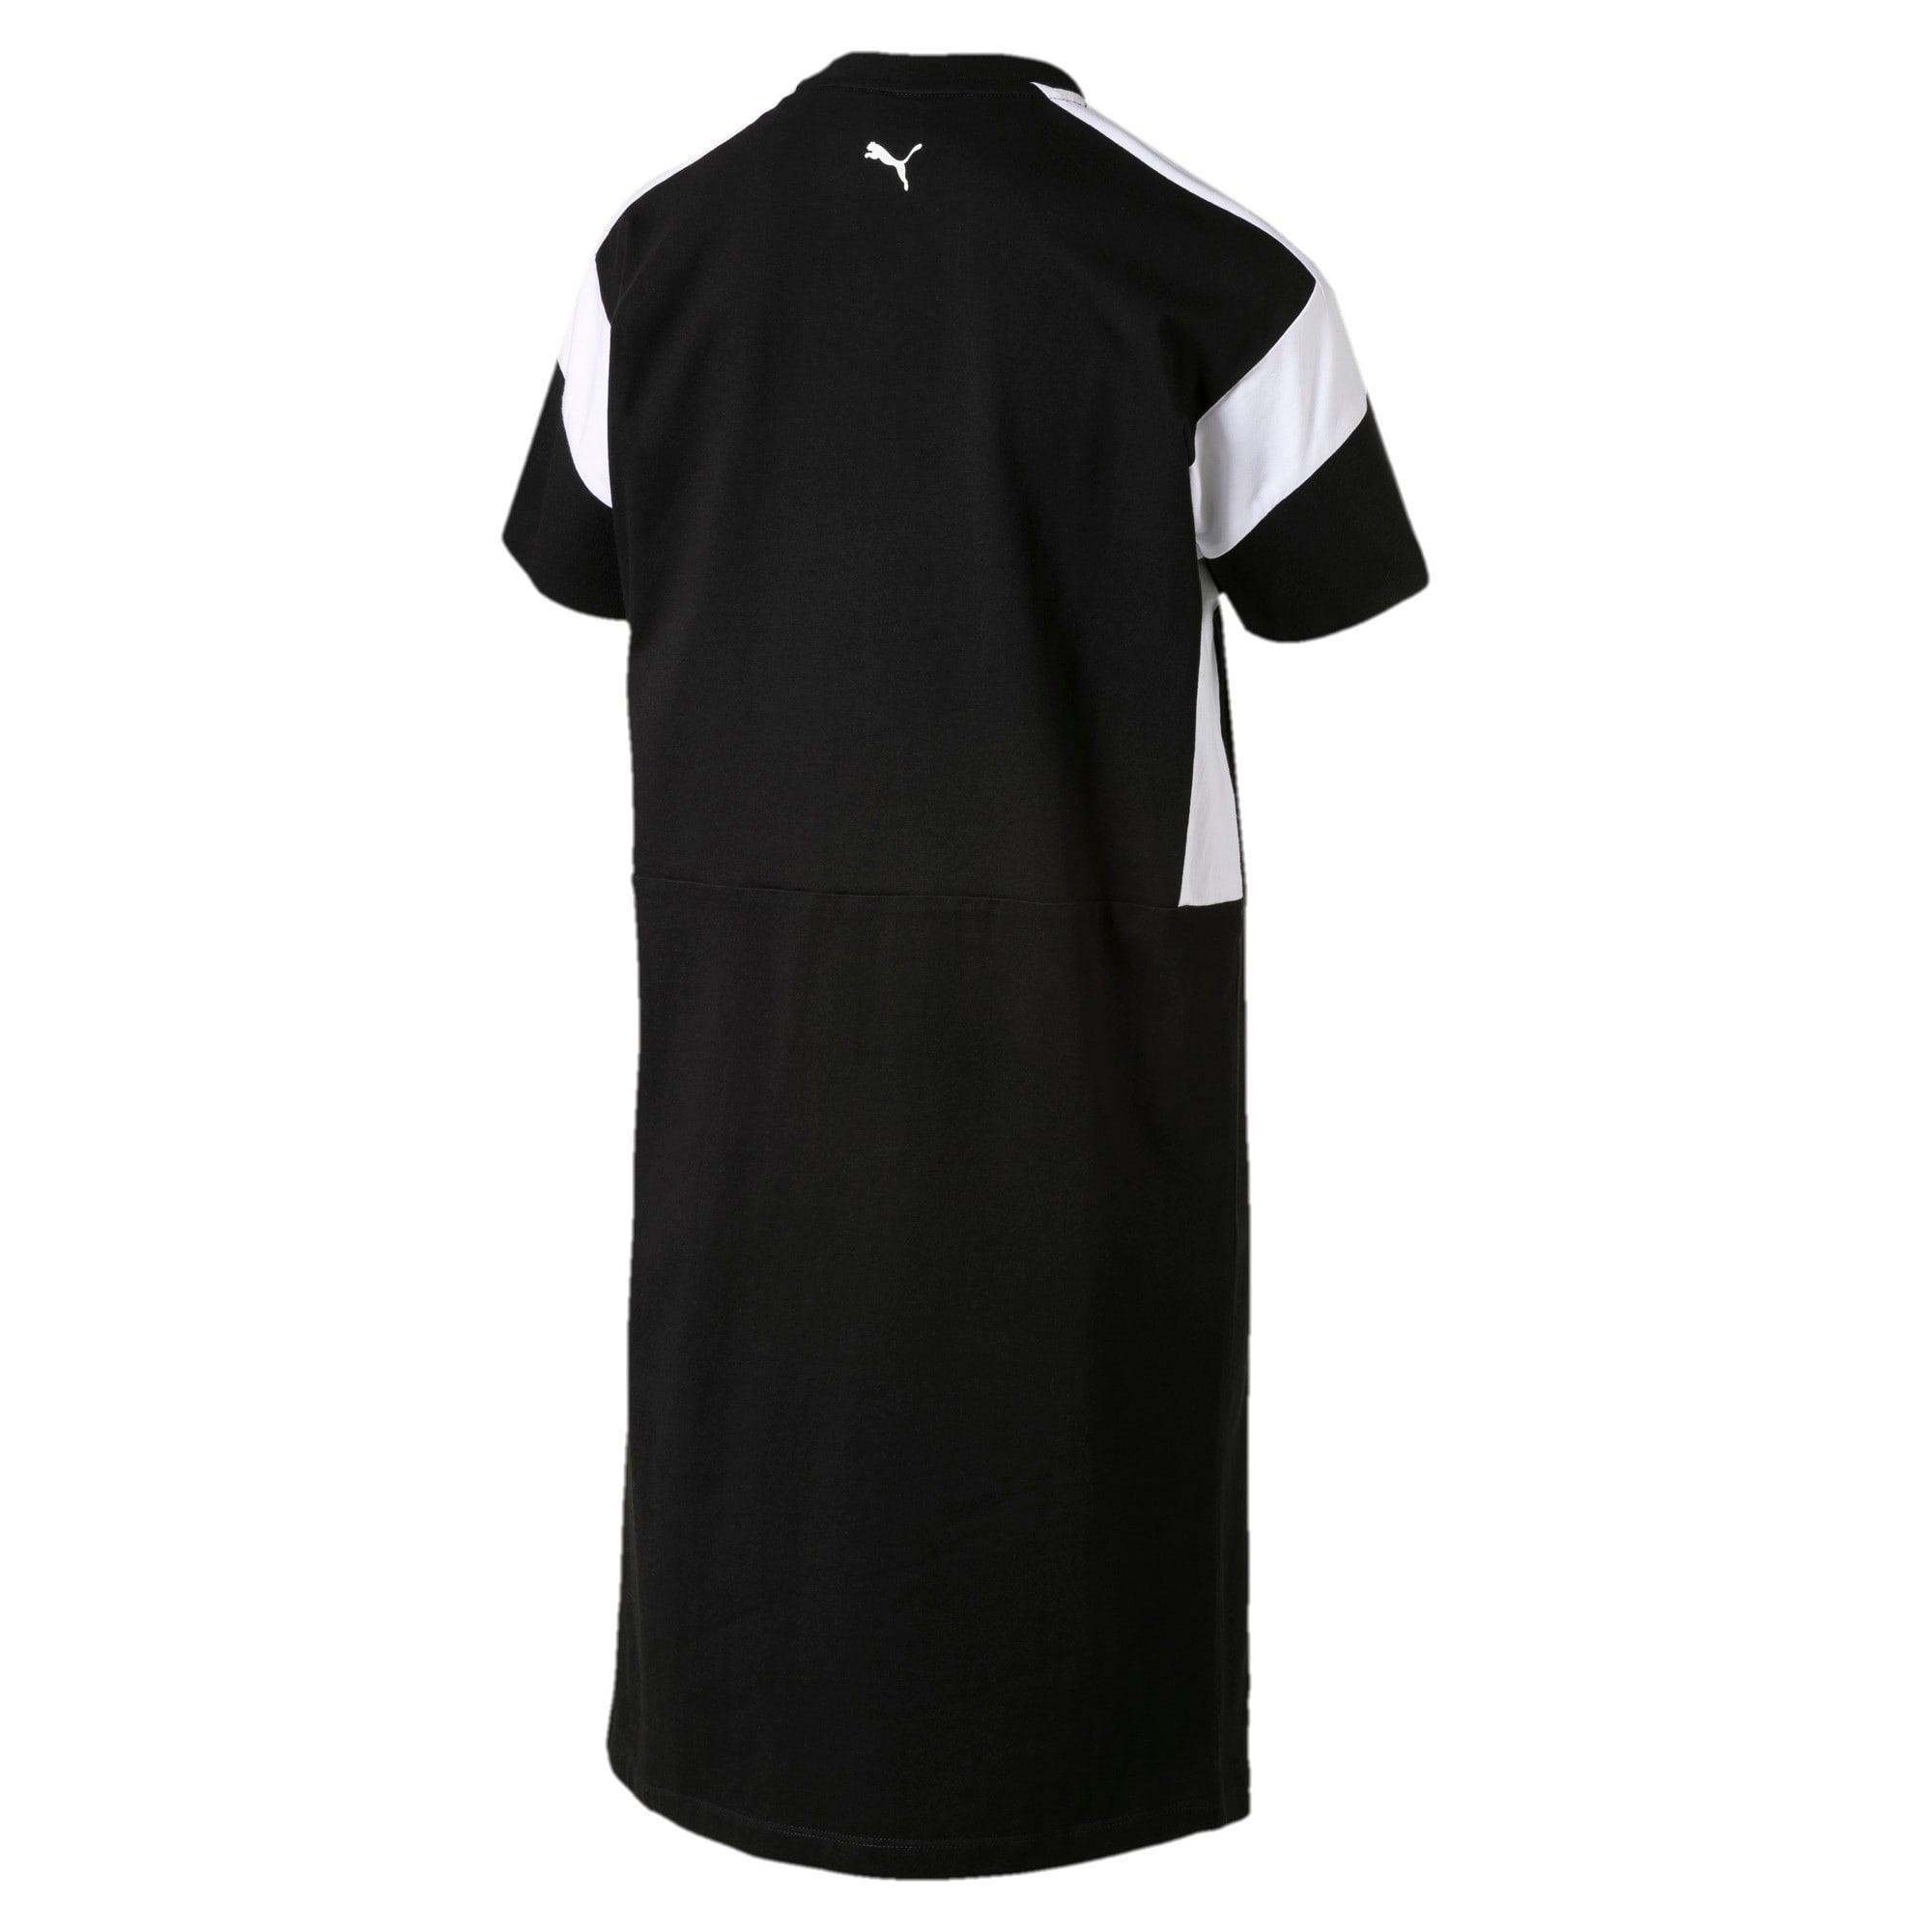 Thumbnail 2 of Chase Dress, Cotton Black, medium